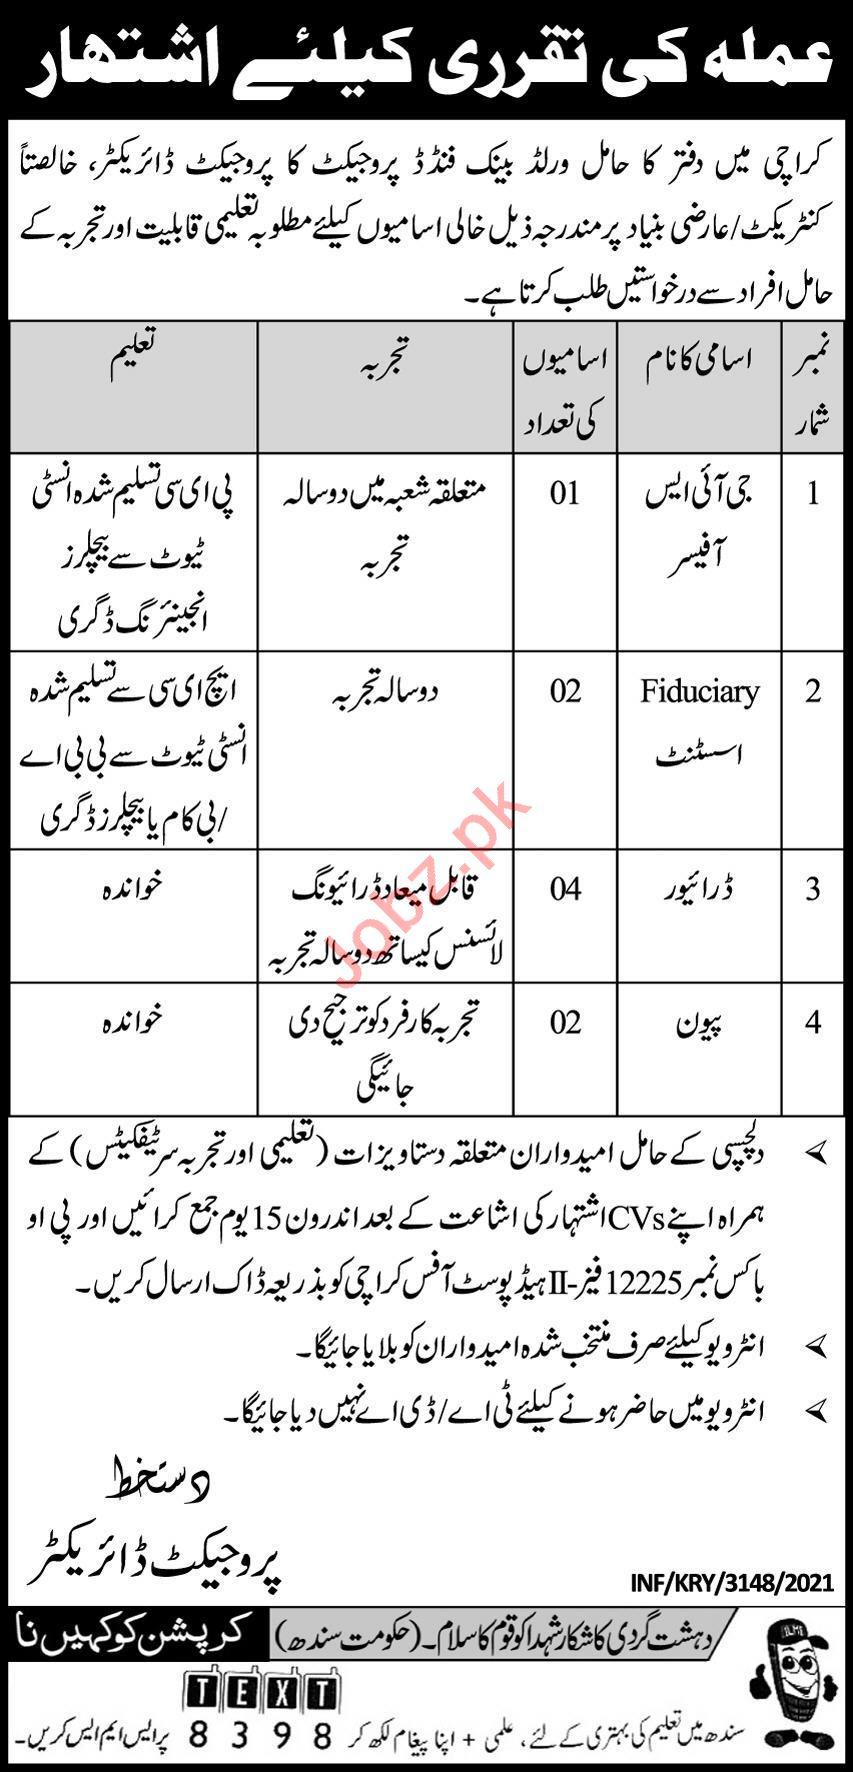 P O Box No 12225 Phase 2 Head Post Office Karachi Jobs 2021